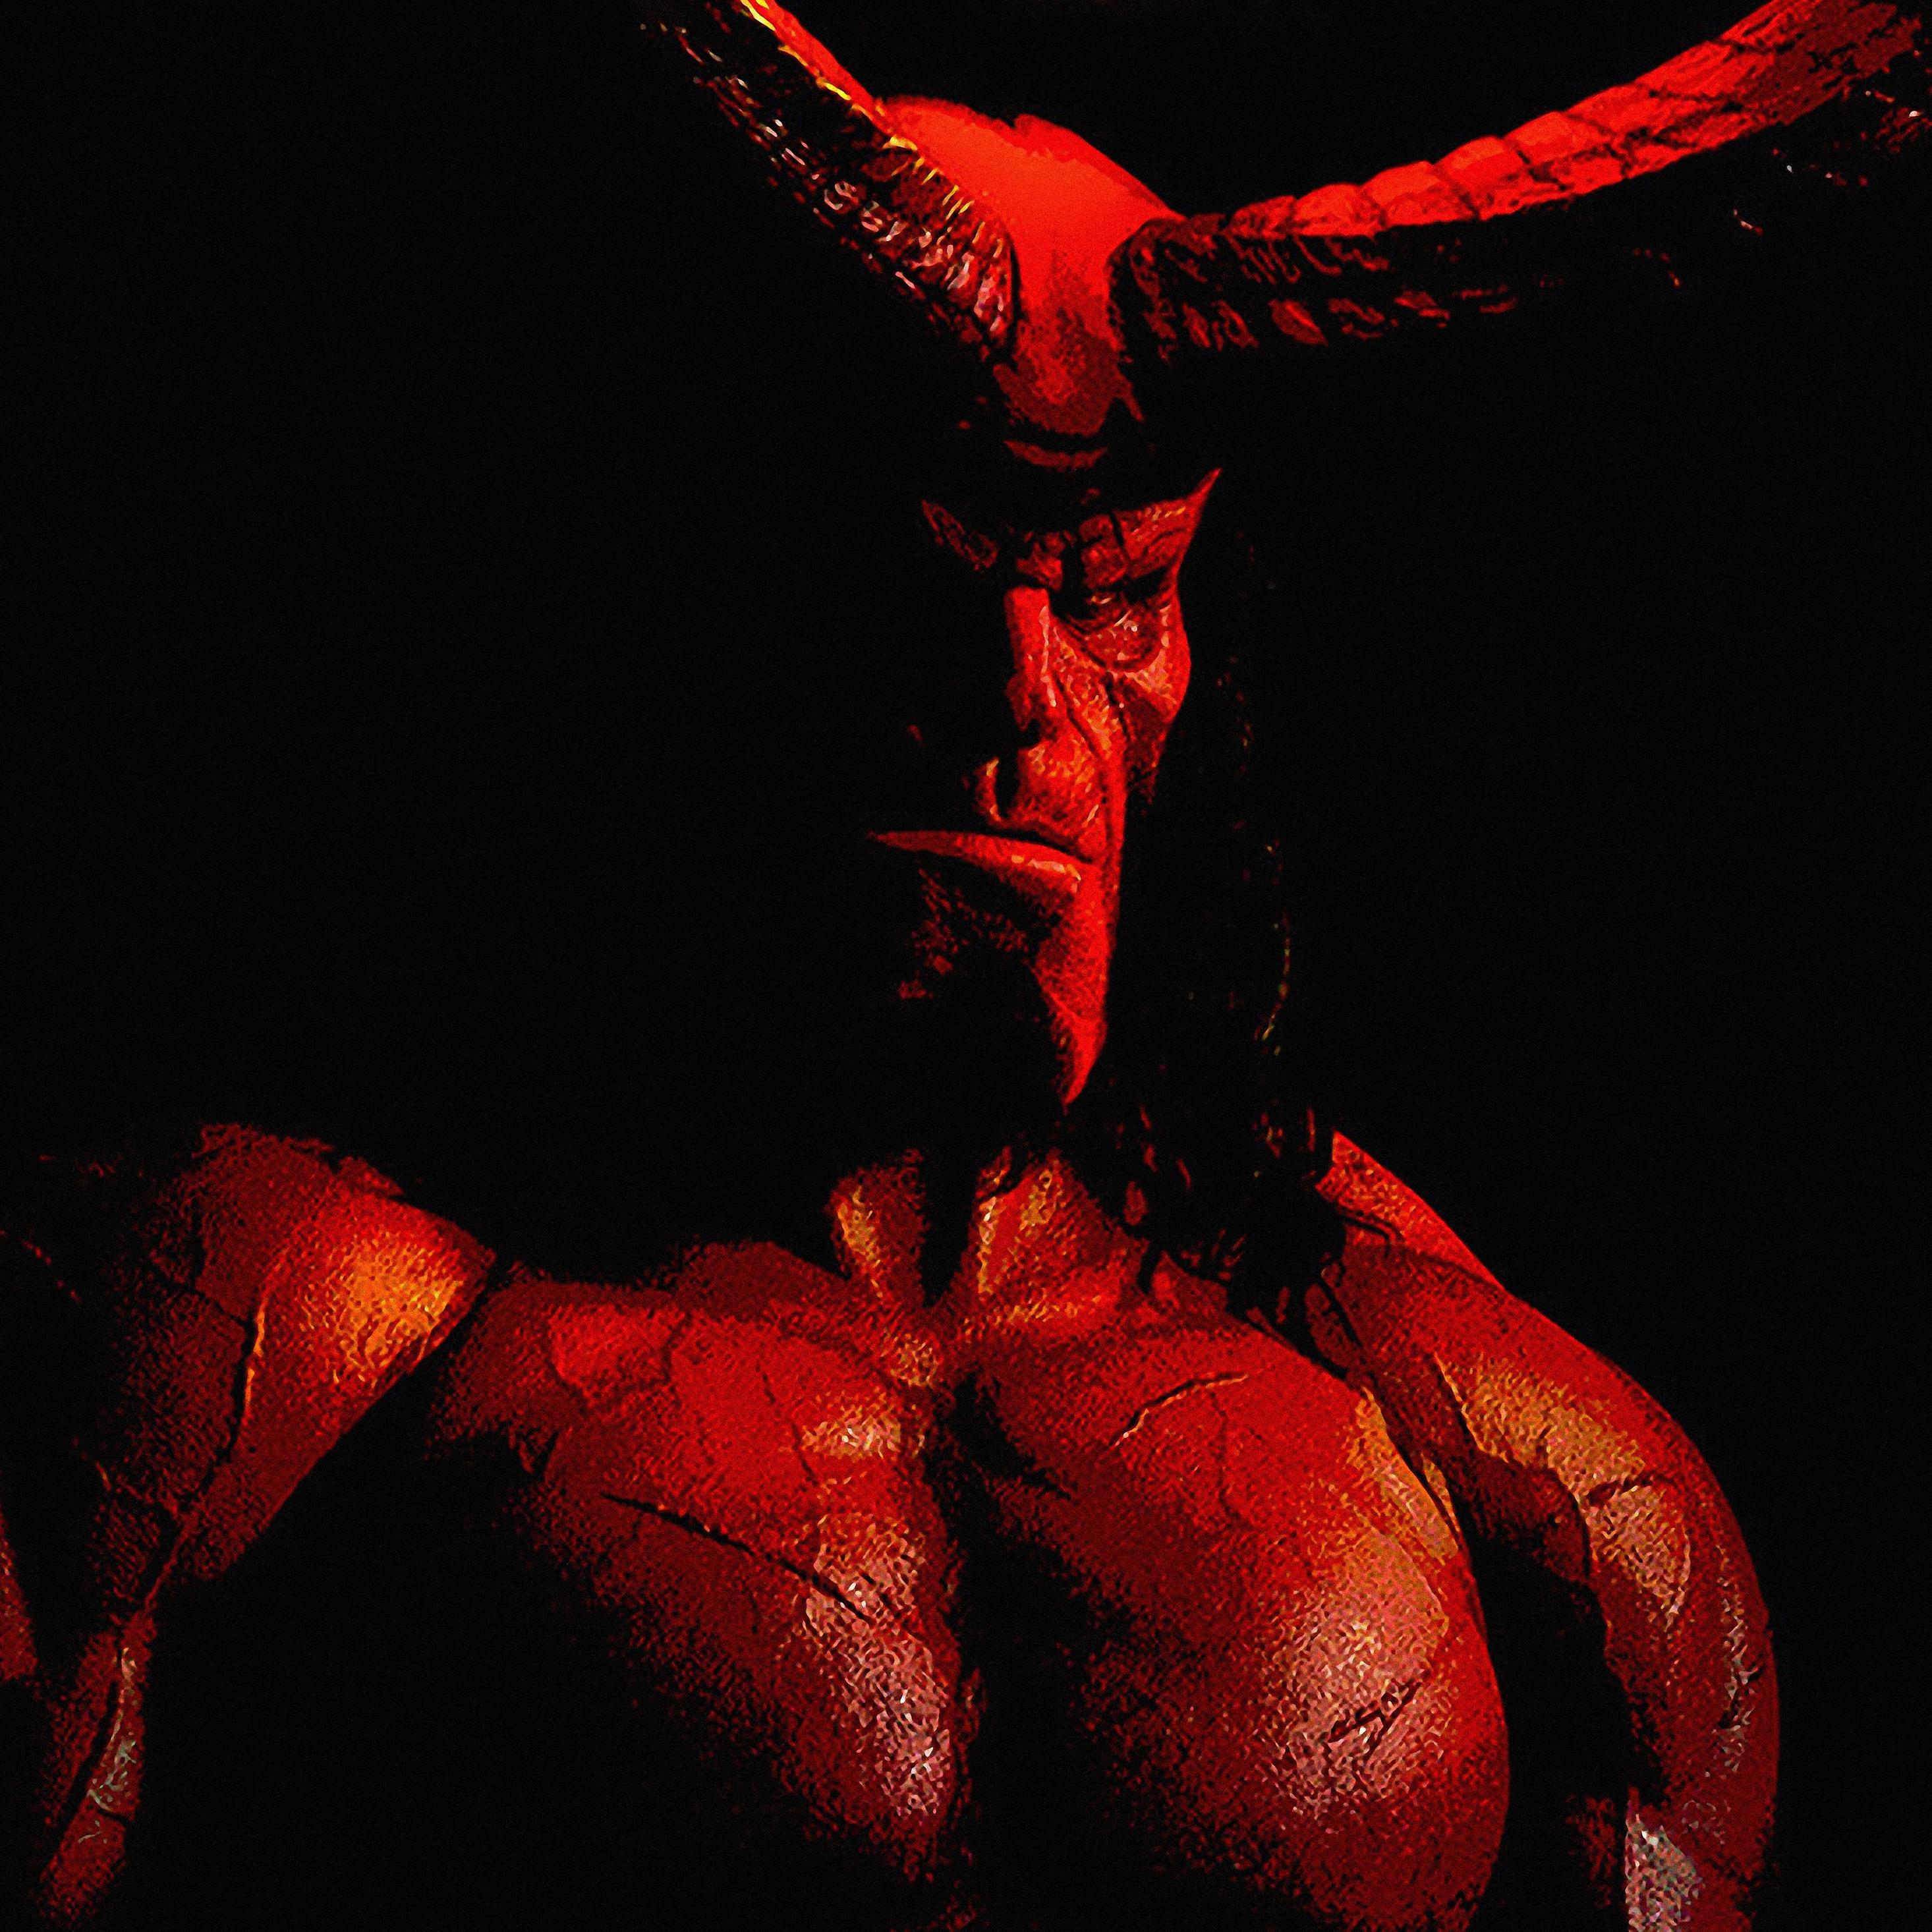 hellboy-5k-2019-poster-xz.jpg